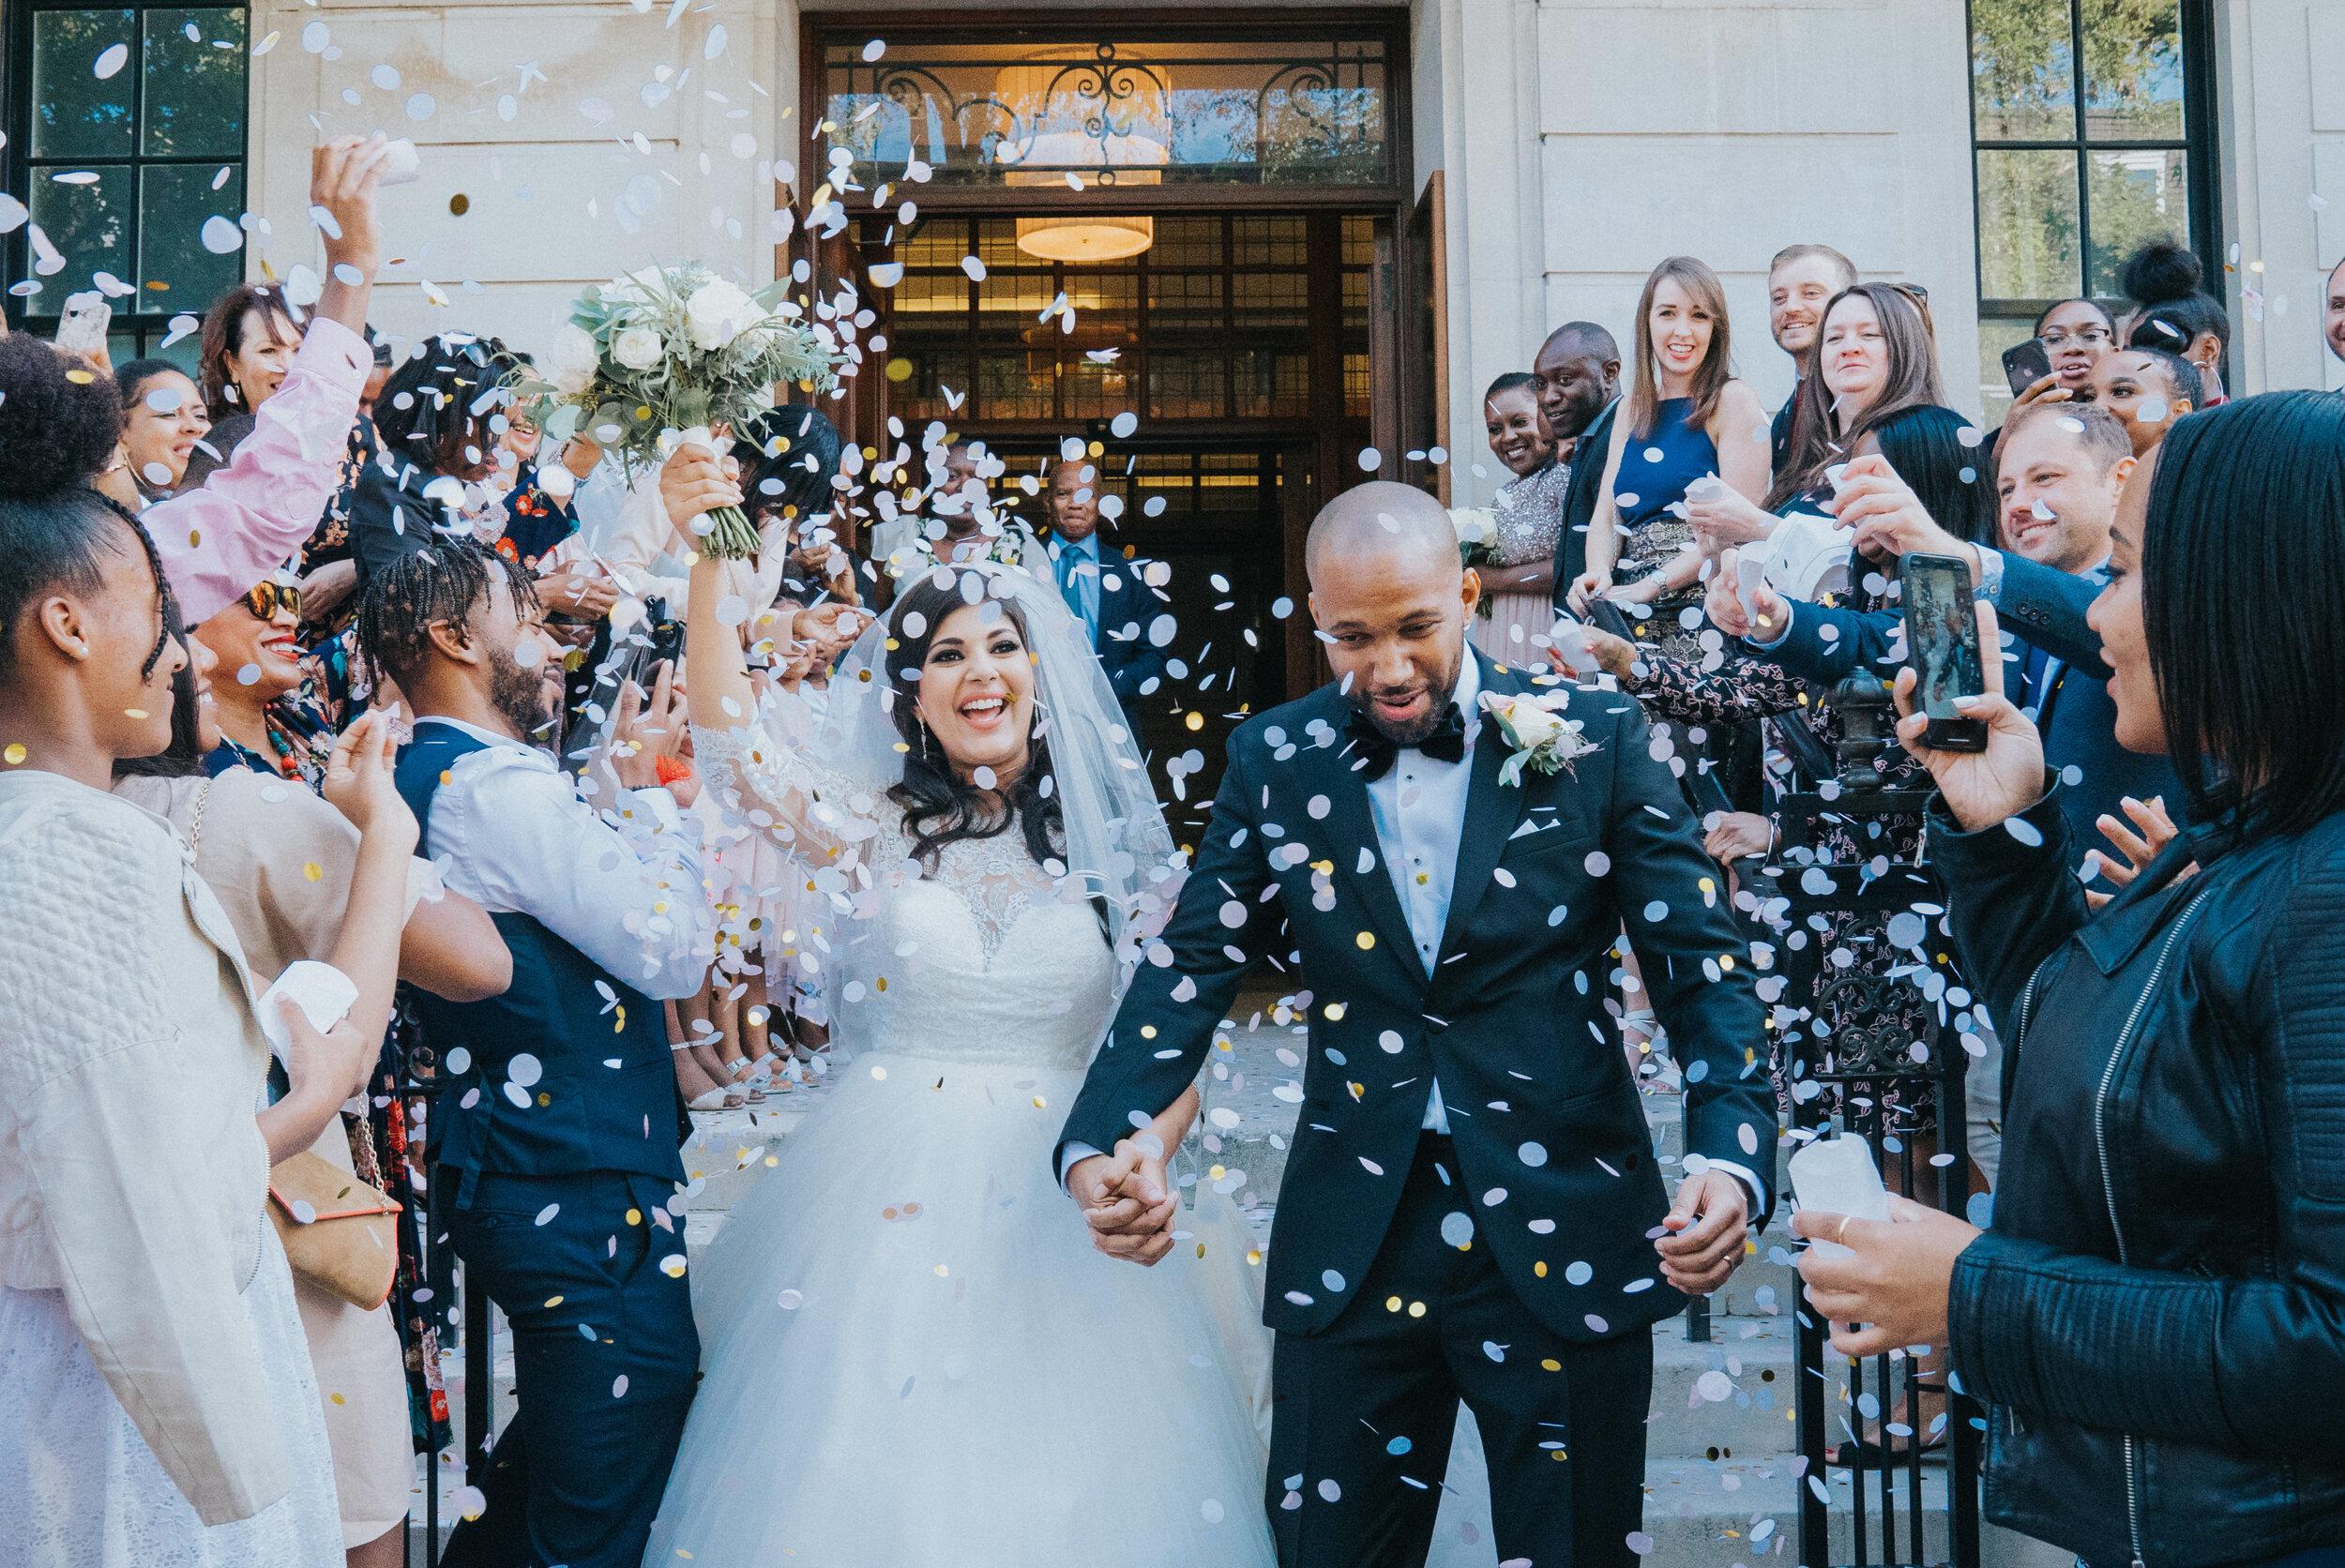 east-london-wedding-photographer-videographer-patriot-square-apartments-58